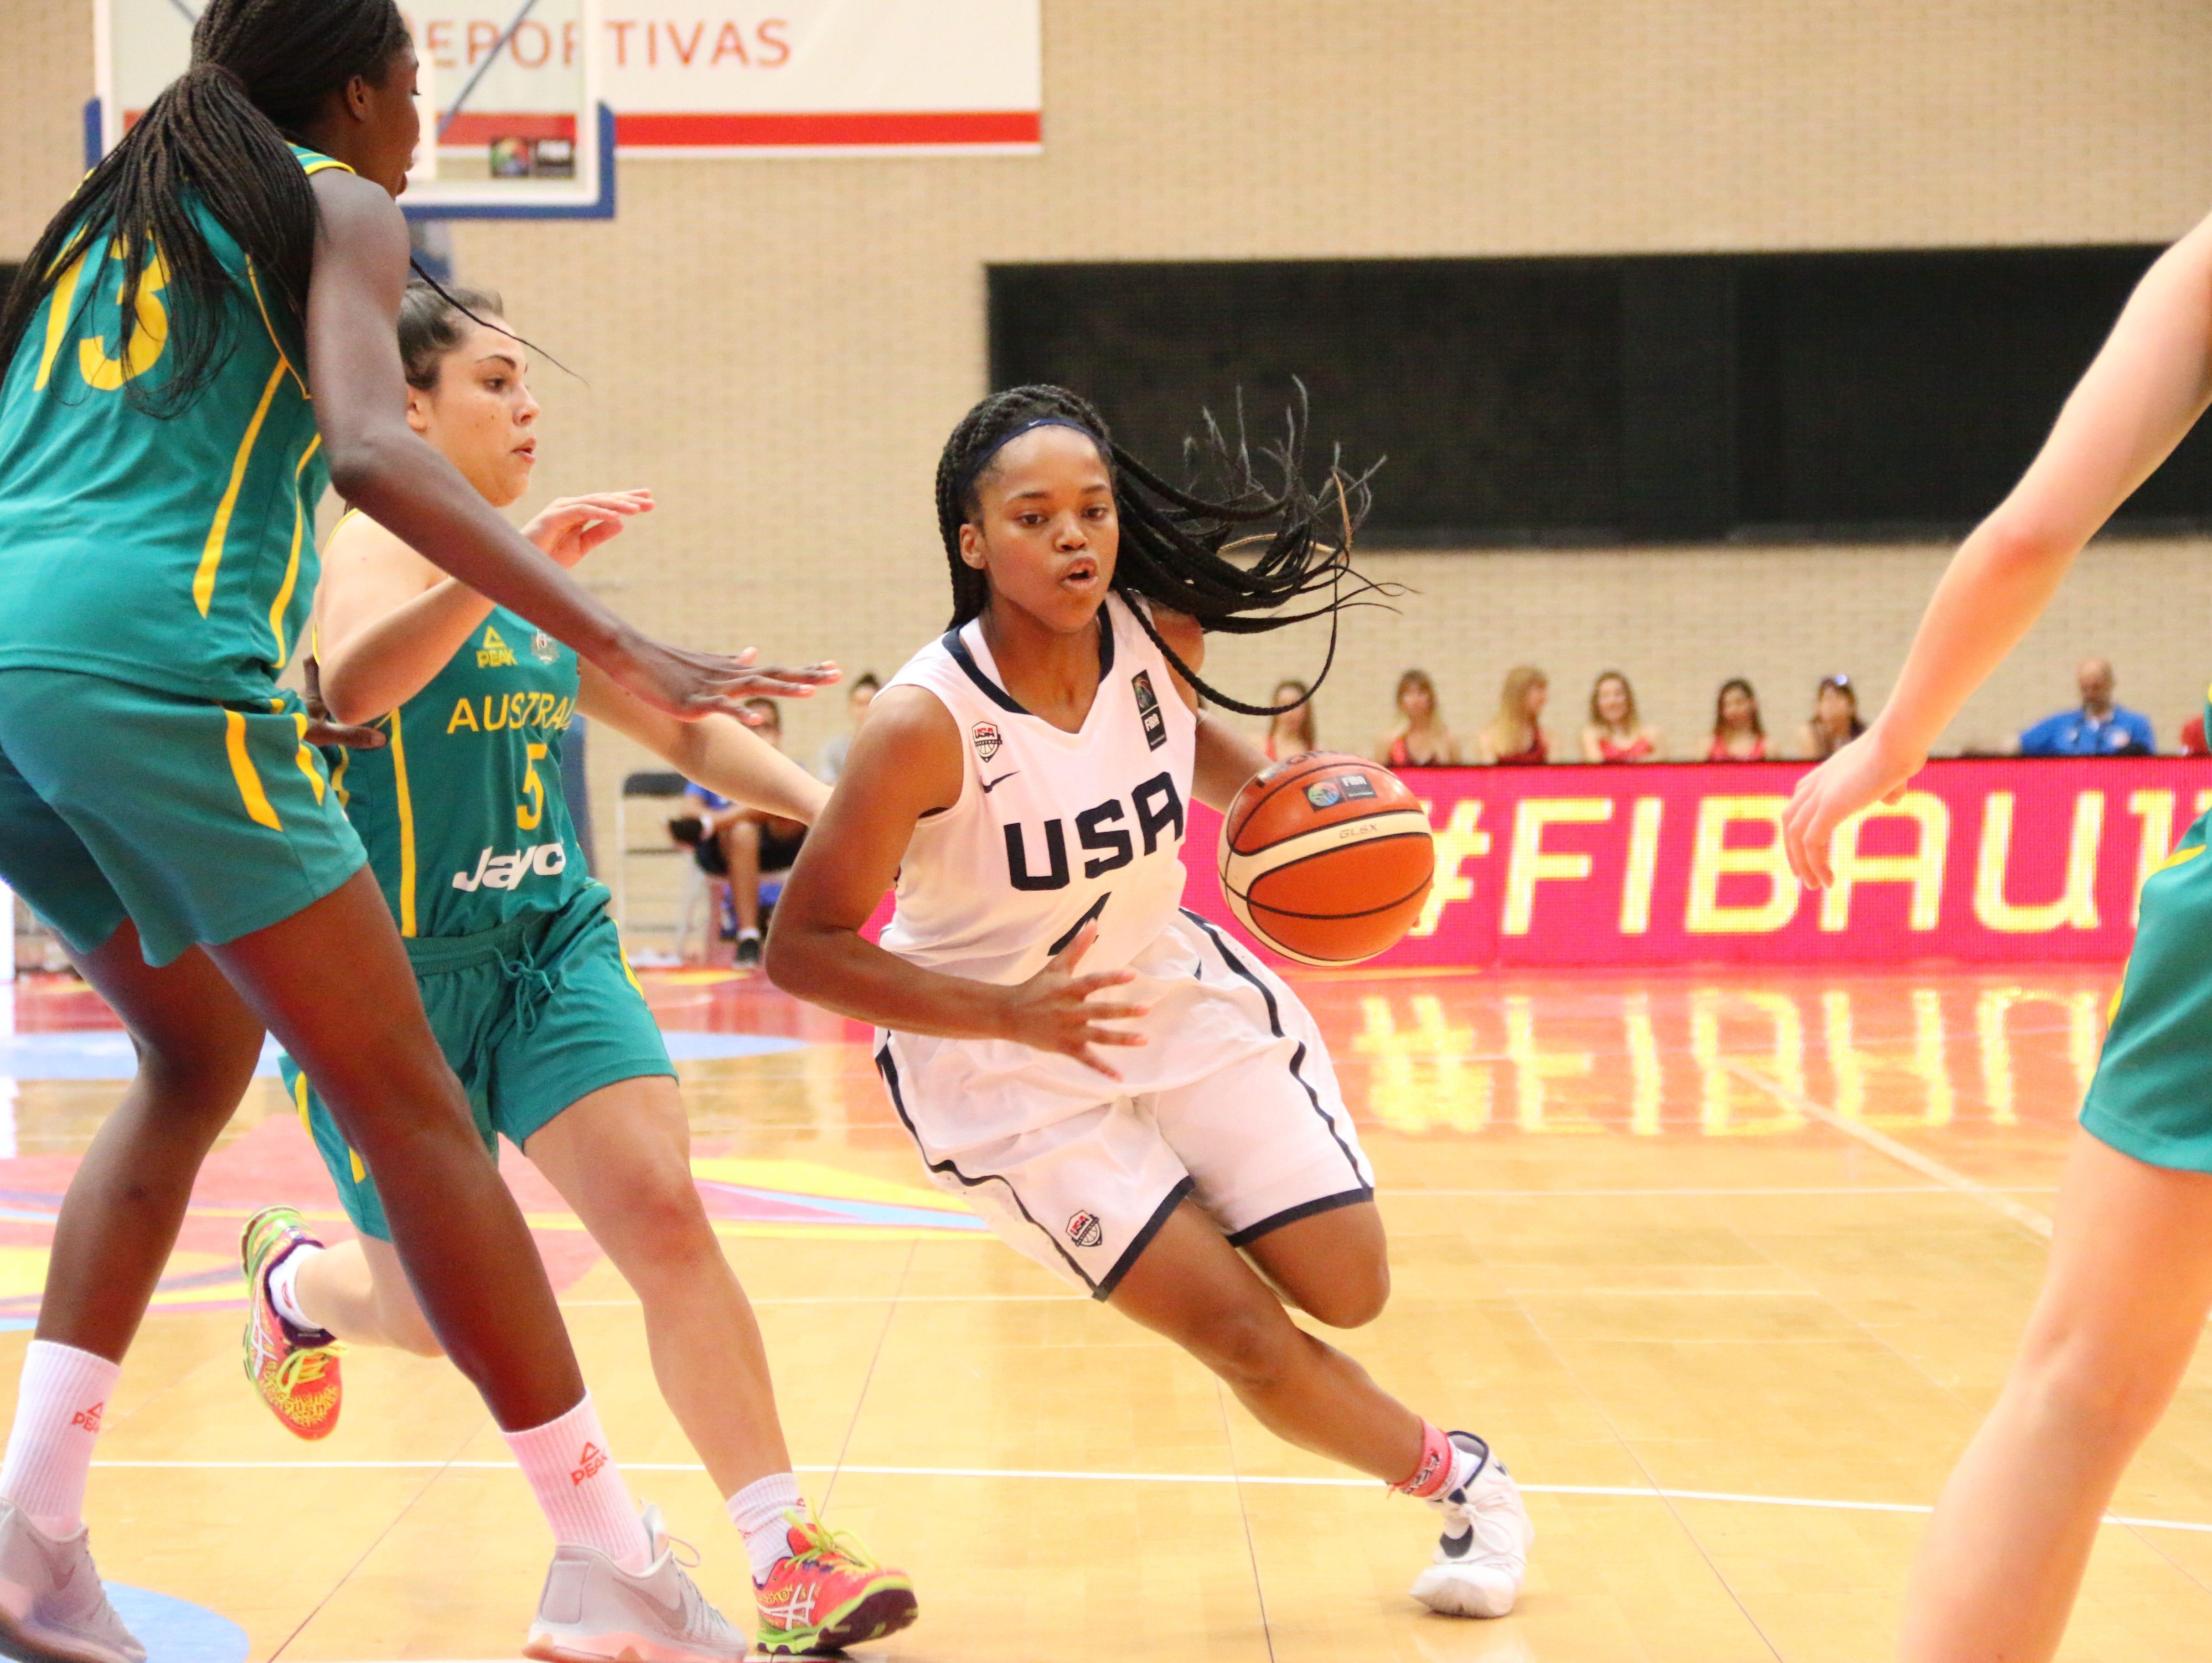 Destanni Henderson drives against Australia in the FIBA U17 Women's World Basketball Championships on Friday, July 1, 2016 in Zaragoza, Spain